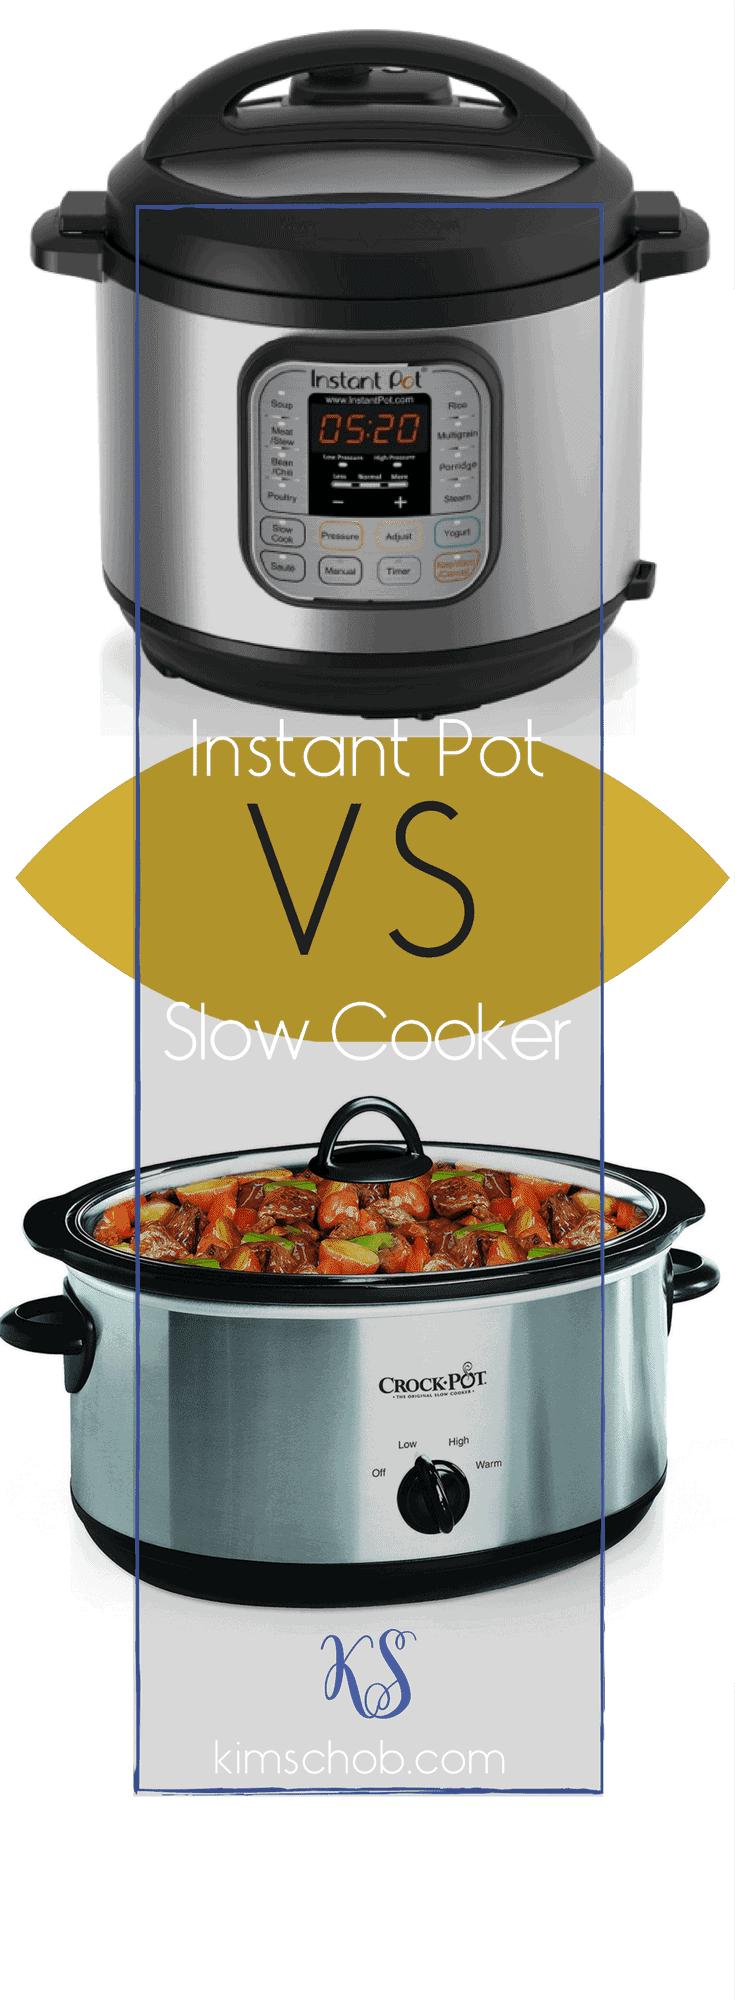 Instant Pot vs Slow Cooker | Winner? Go to the Cards/Blog #slowcooker #instantpot #kimschob